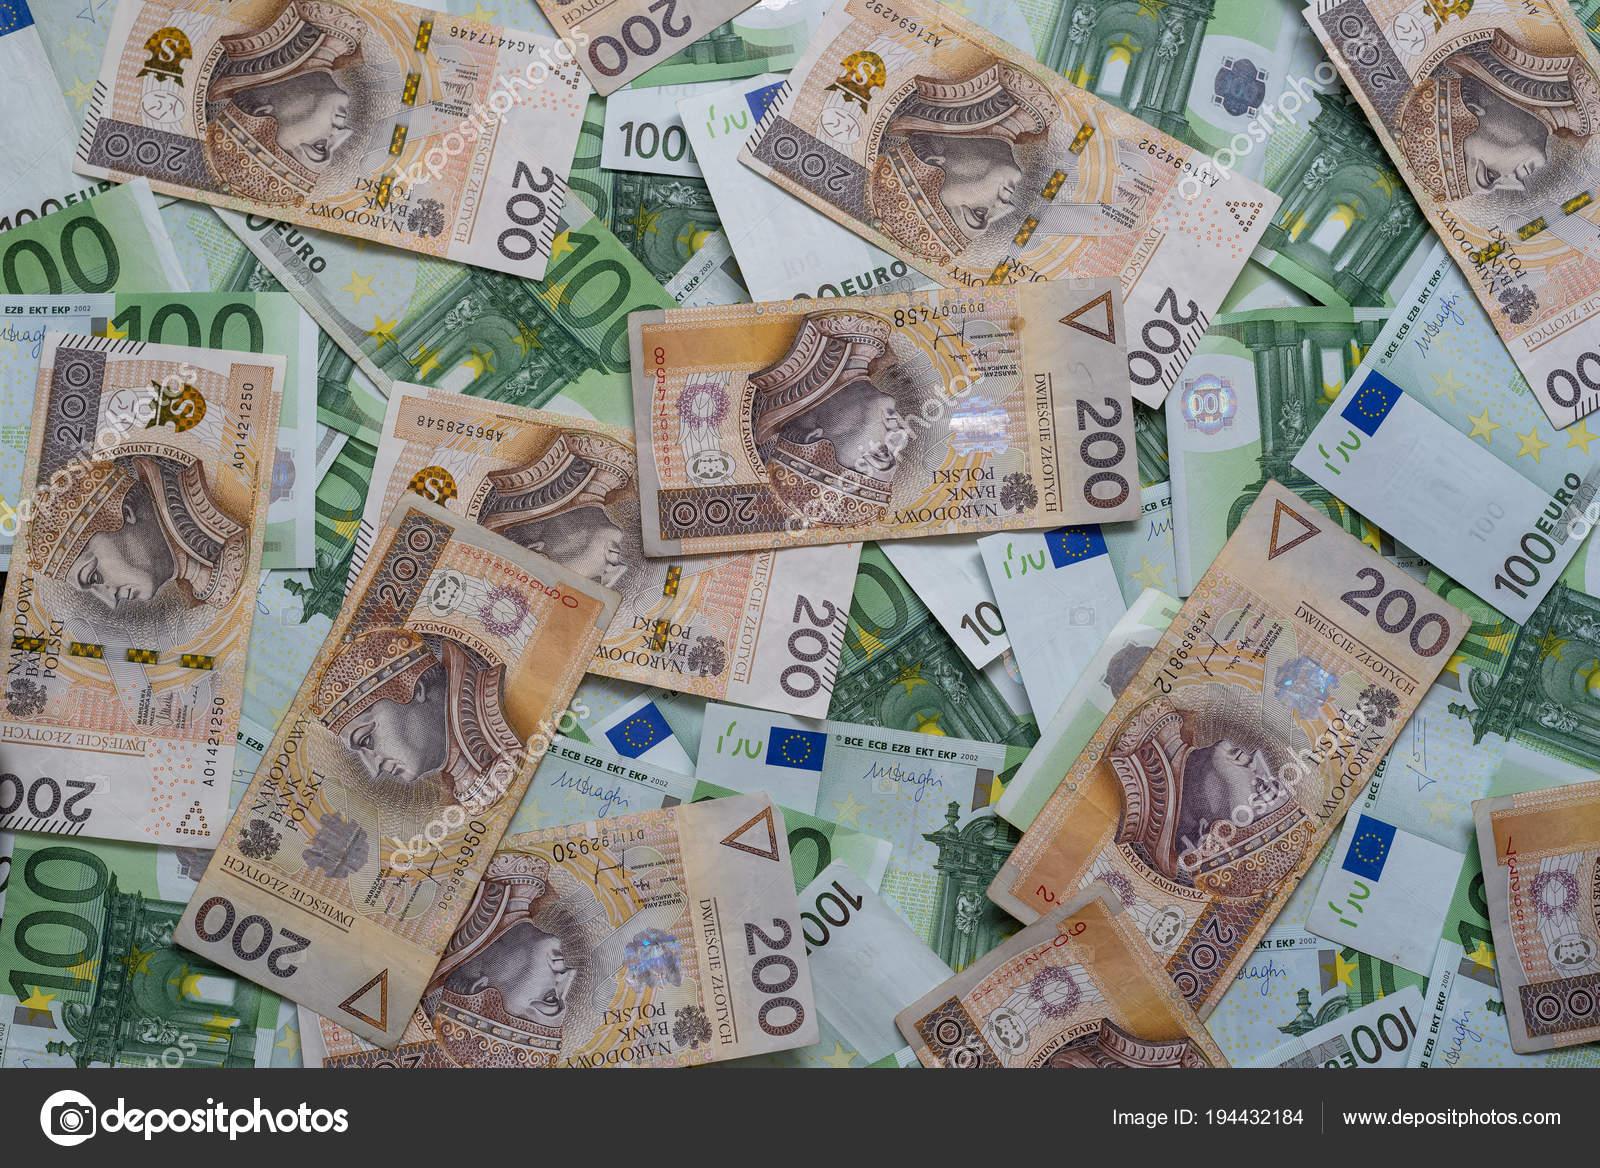 Poland Warszawa April 2018 Scattered 100 Euro 200 Pln